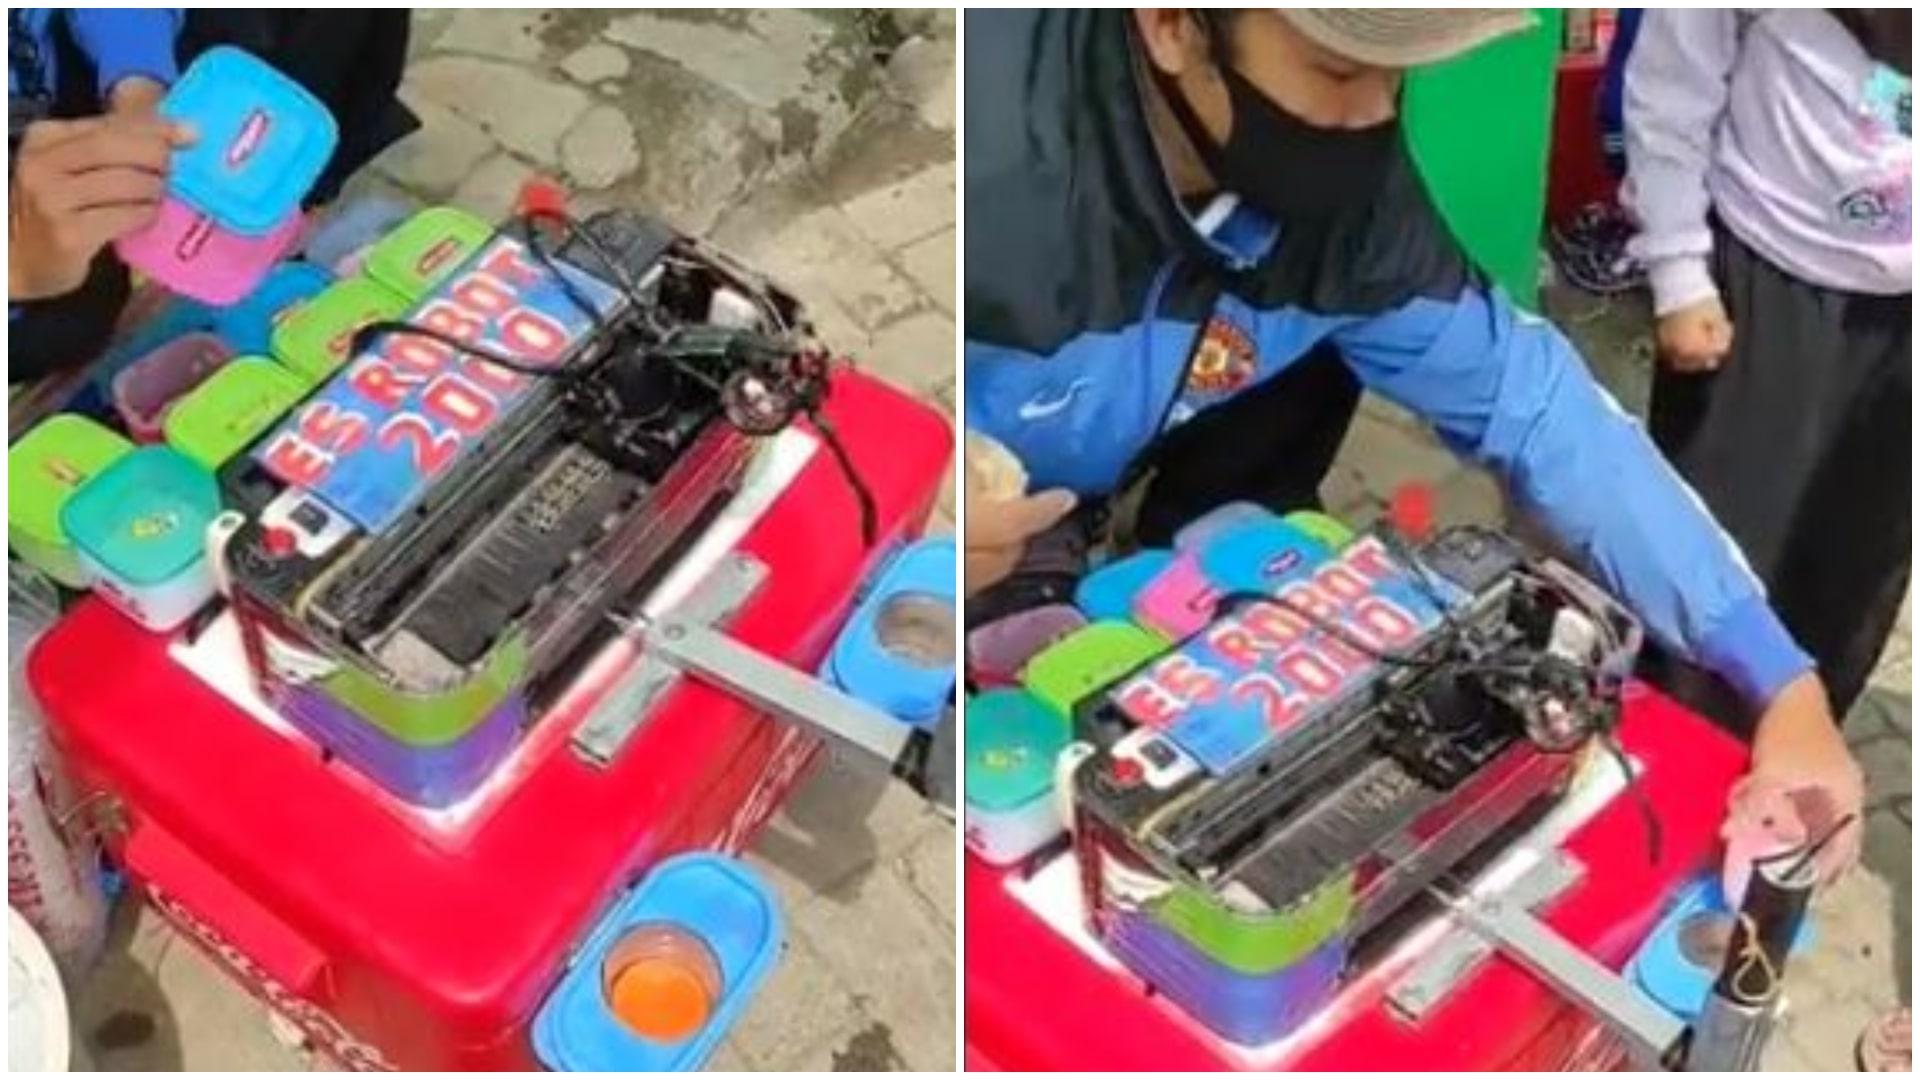 Viral Canggihnya Mesin Es Robot, Warganet: UMKM Bukit Algoritma